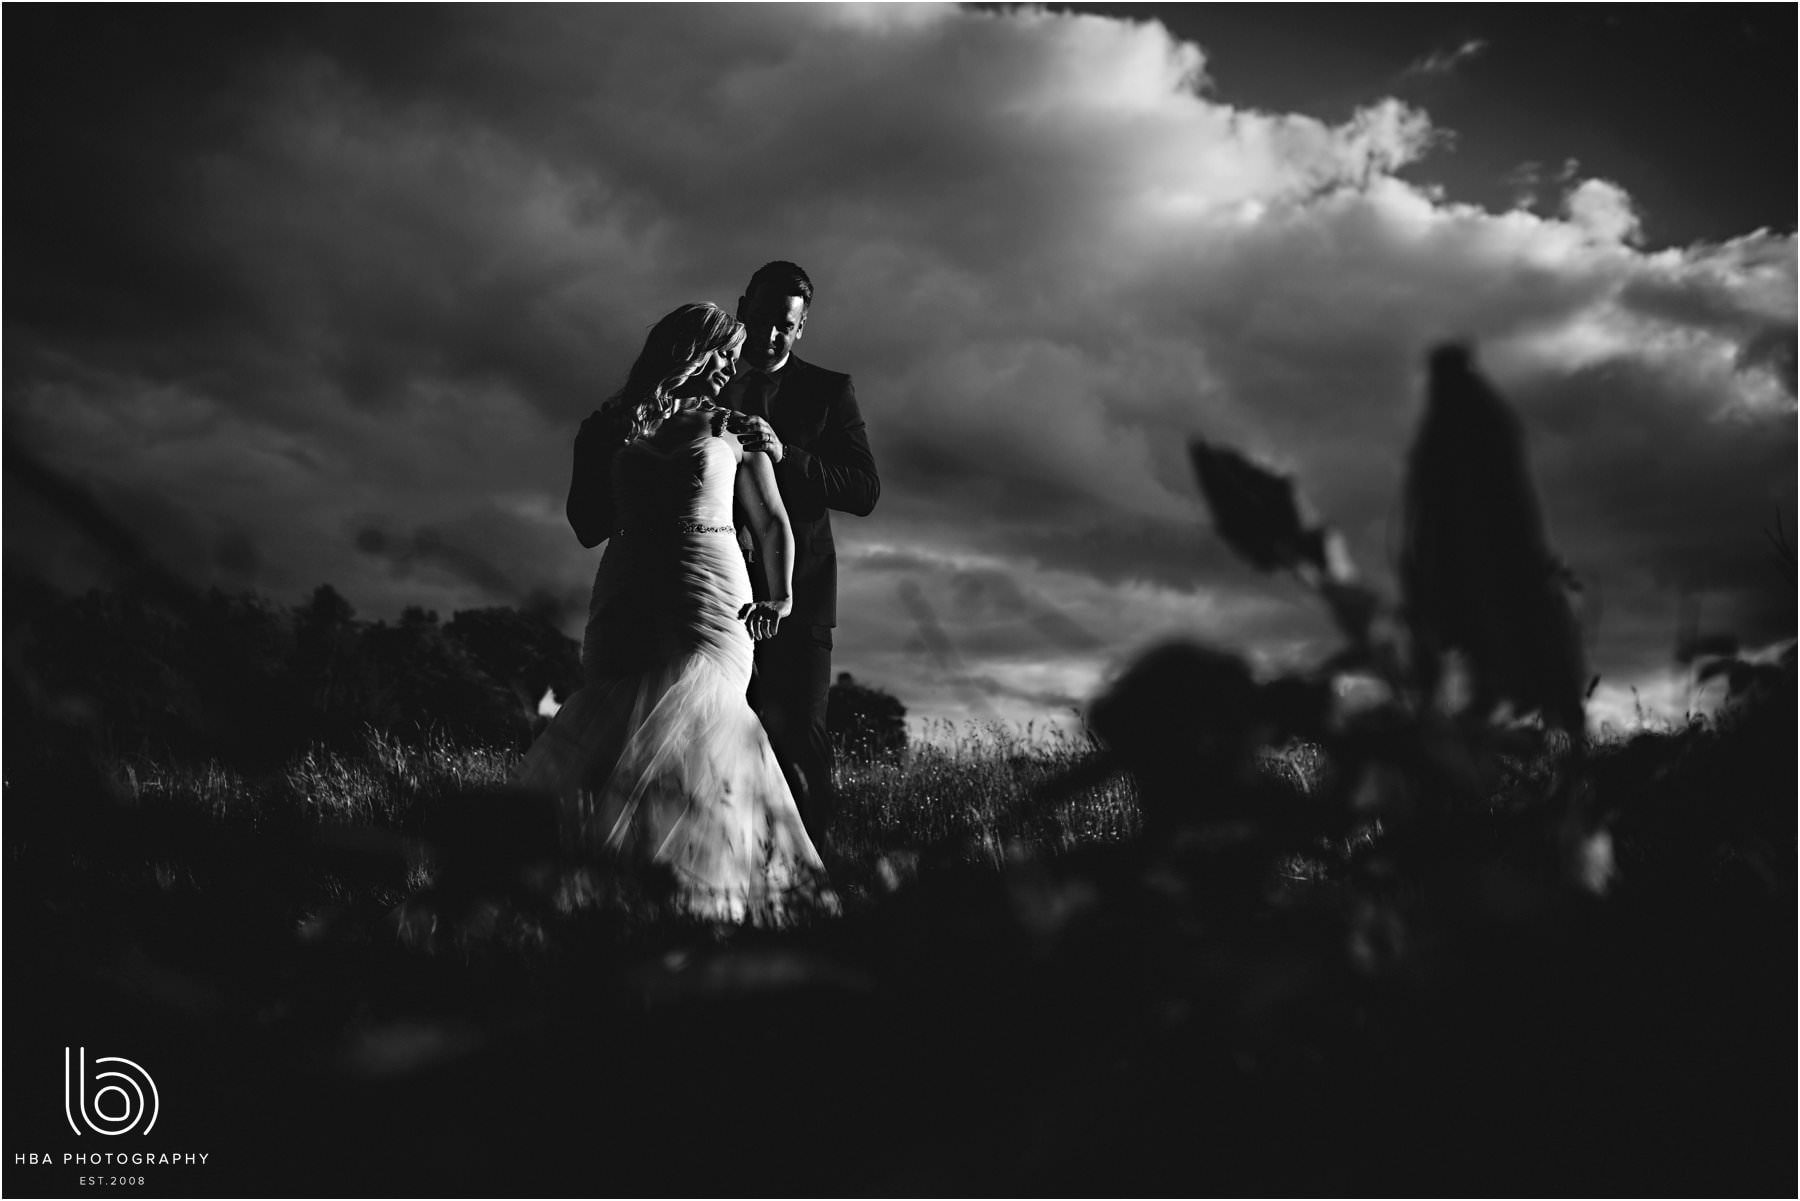 The bride & groom in B&W